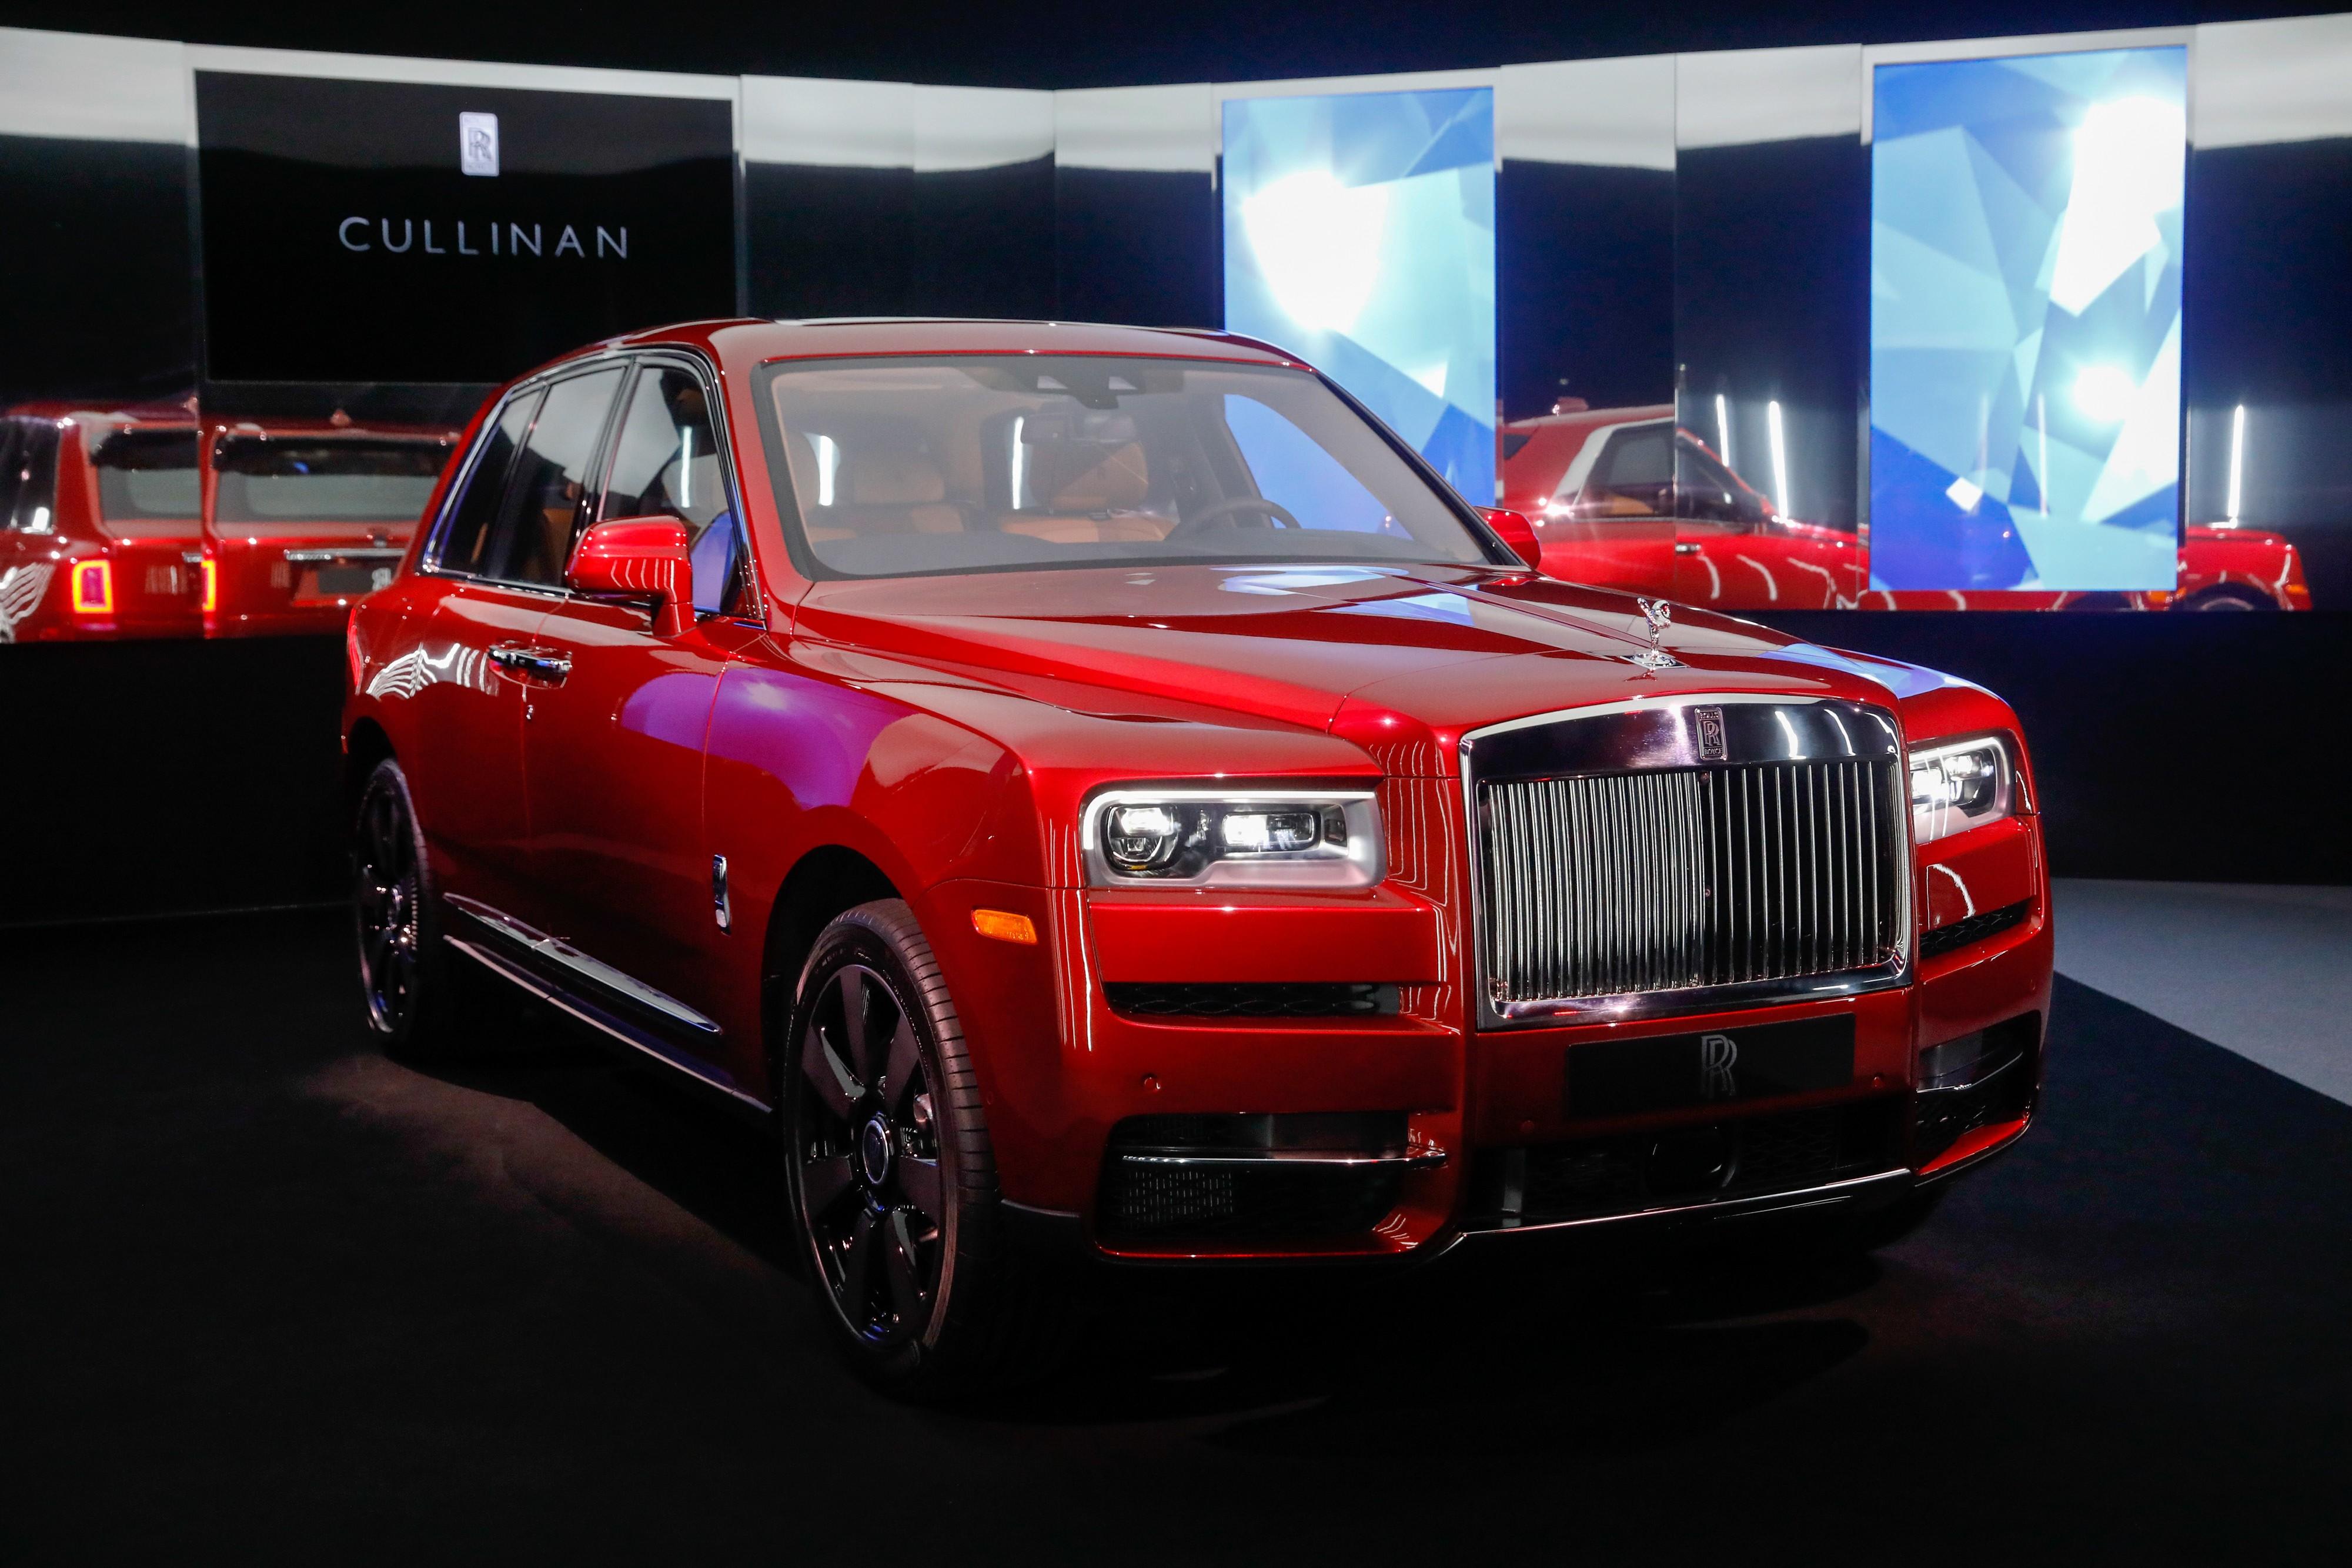 A Peek At Us 325 000 Rolls Royce Cullinan The World S